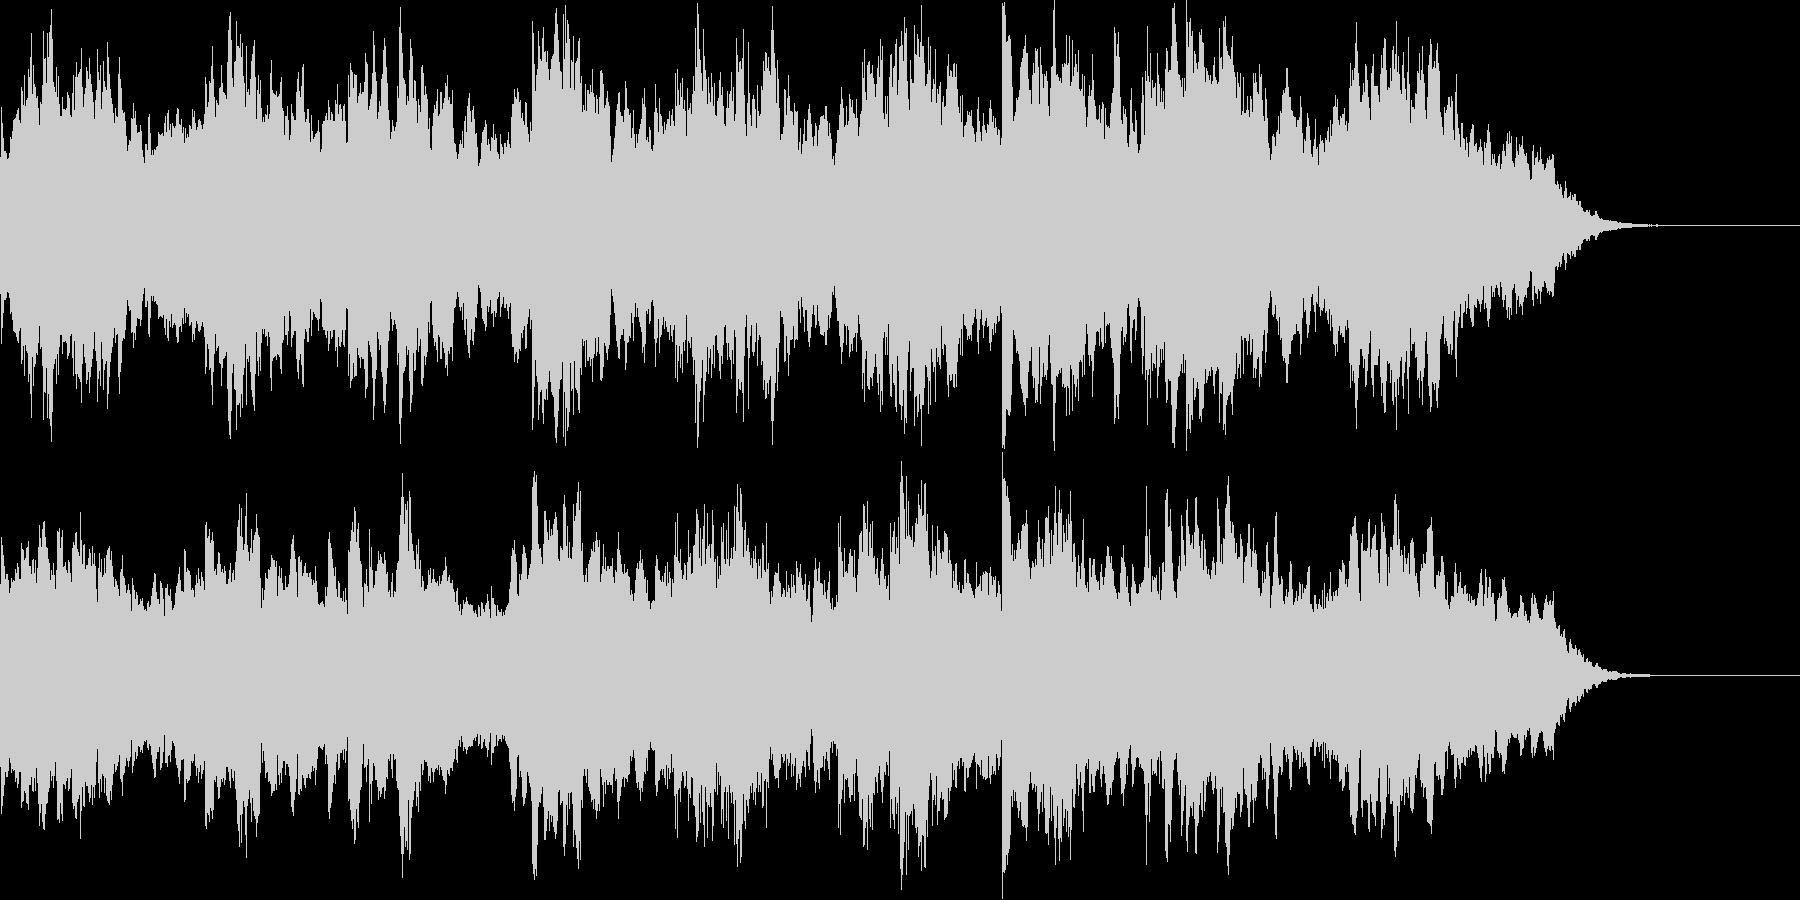 creo_leo_bgm32の未再生の波形